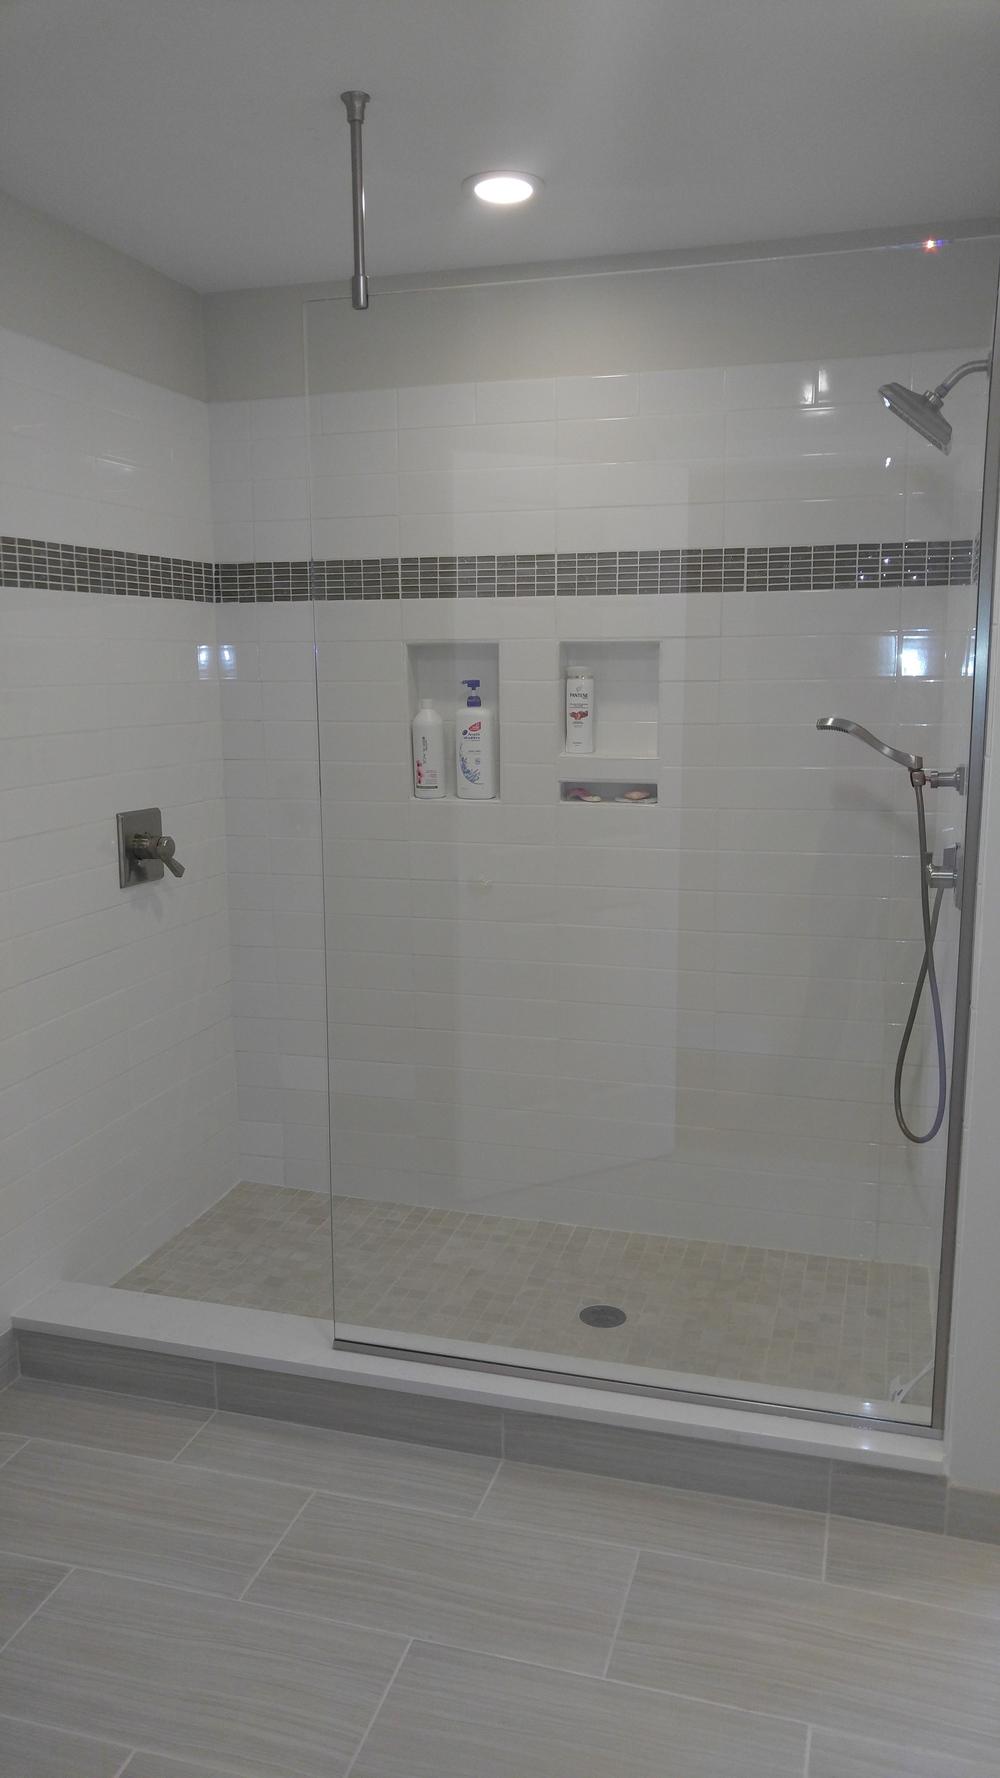 Bathroom Renovation/Remodel - Sutton, MA